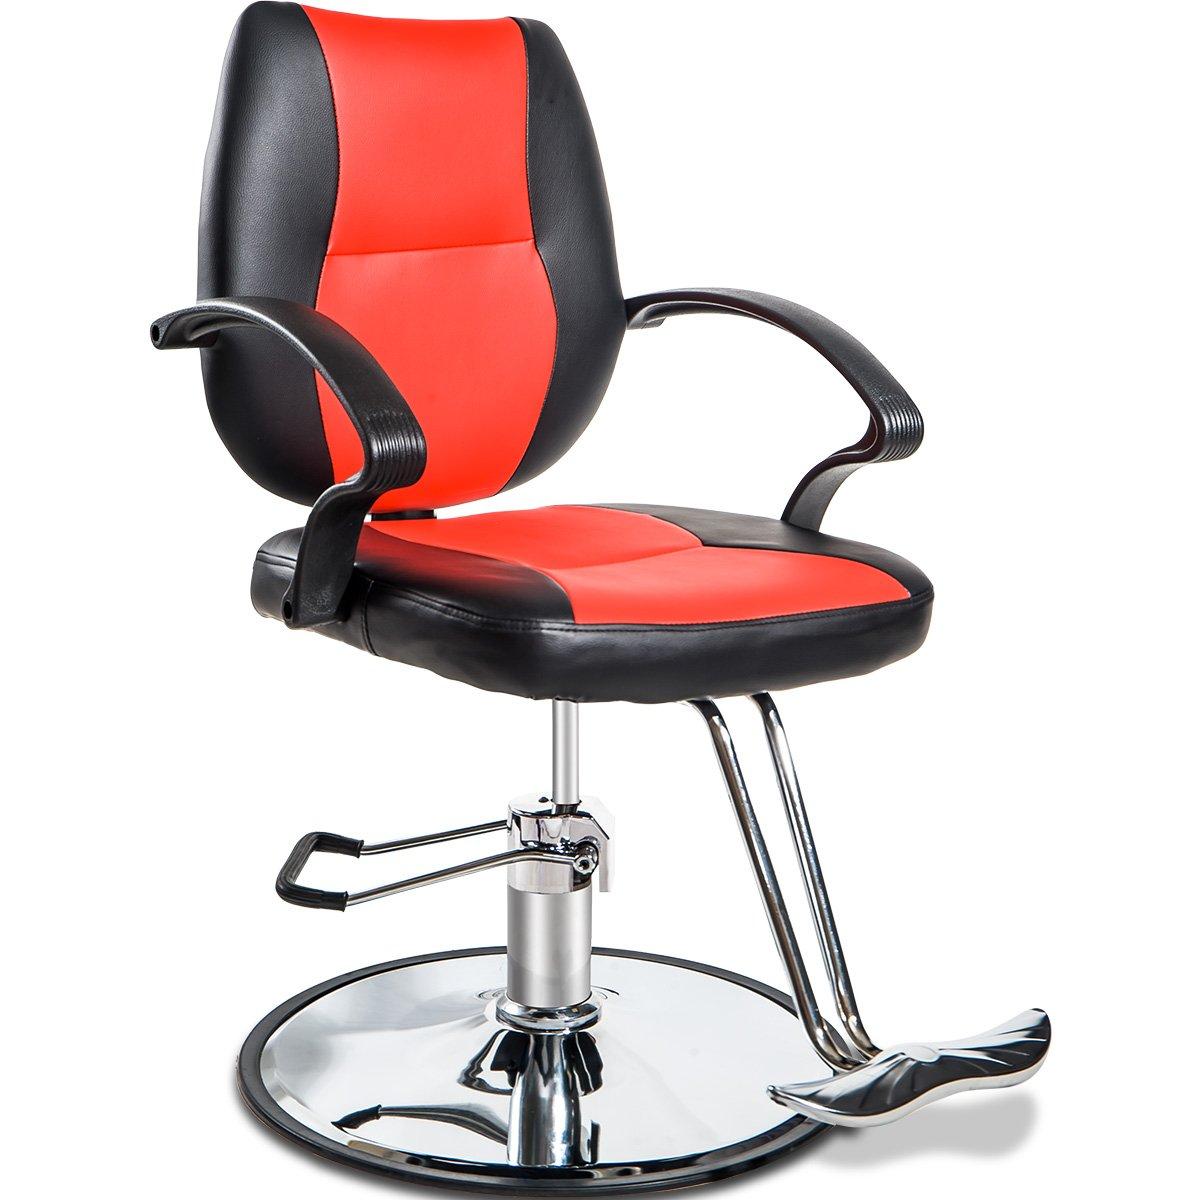 Merax Classic Hydraulic Barber Chair Styling Salon Beauty Shampoo Spa Equipment